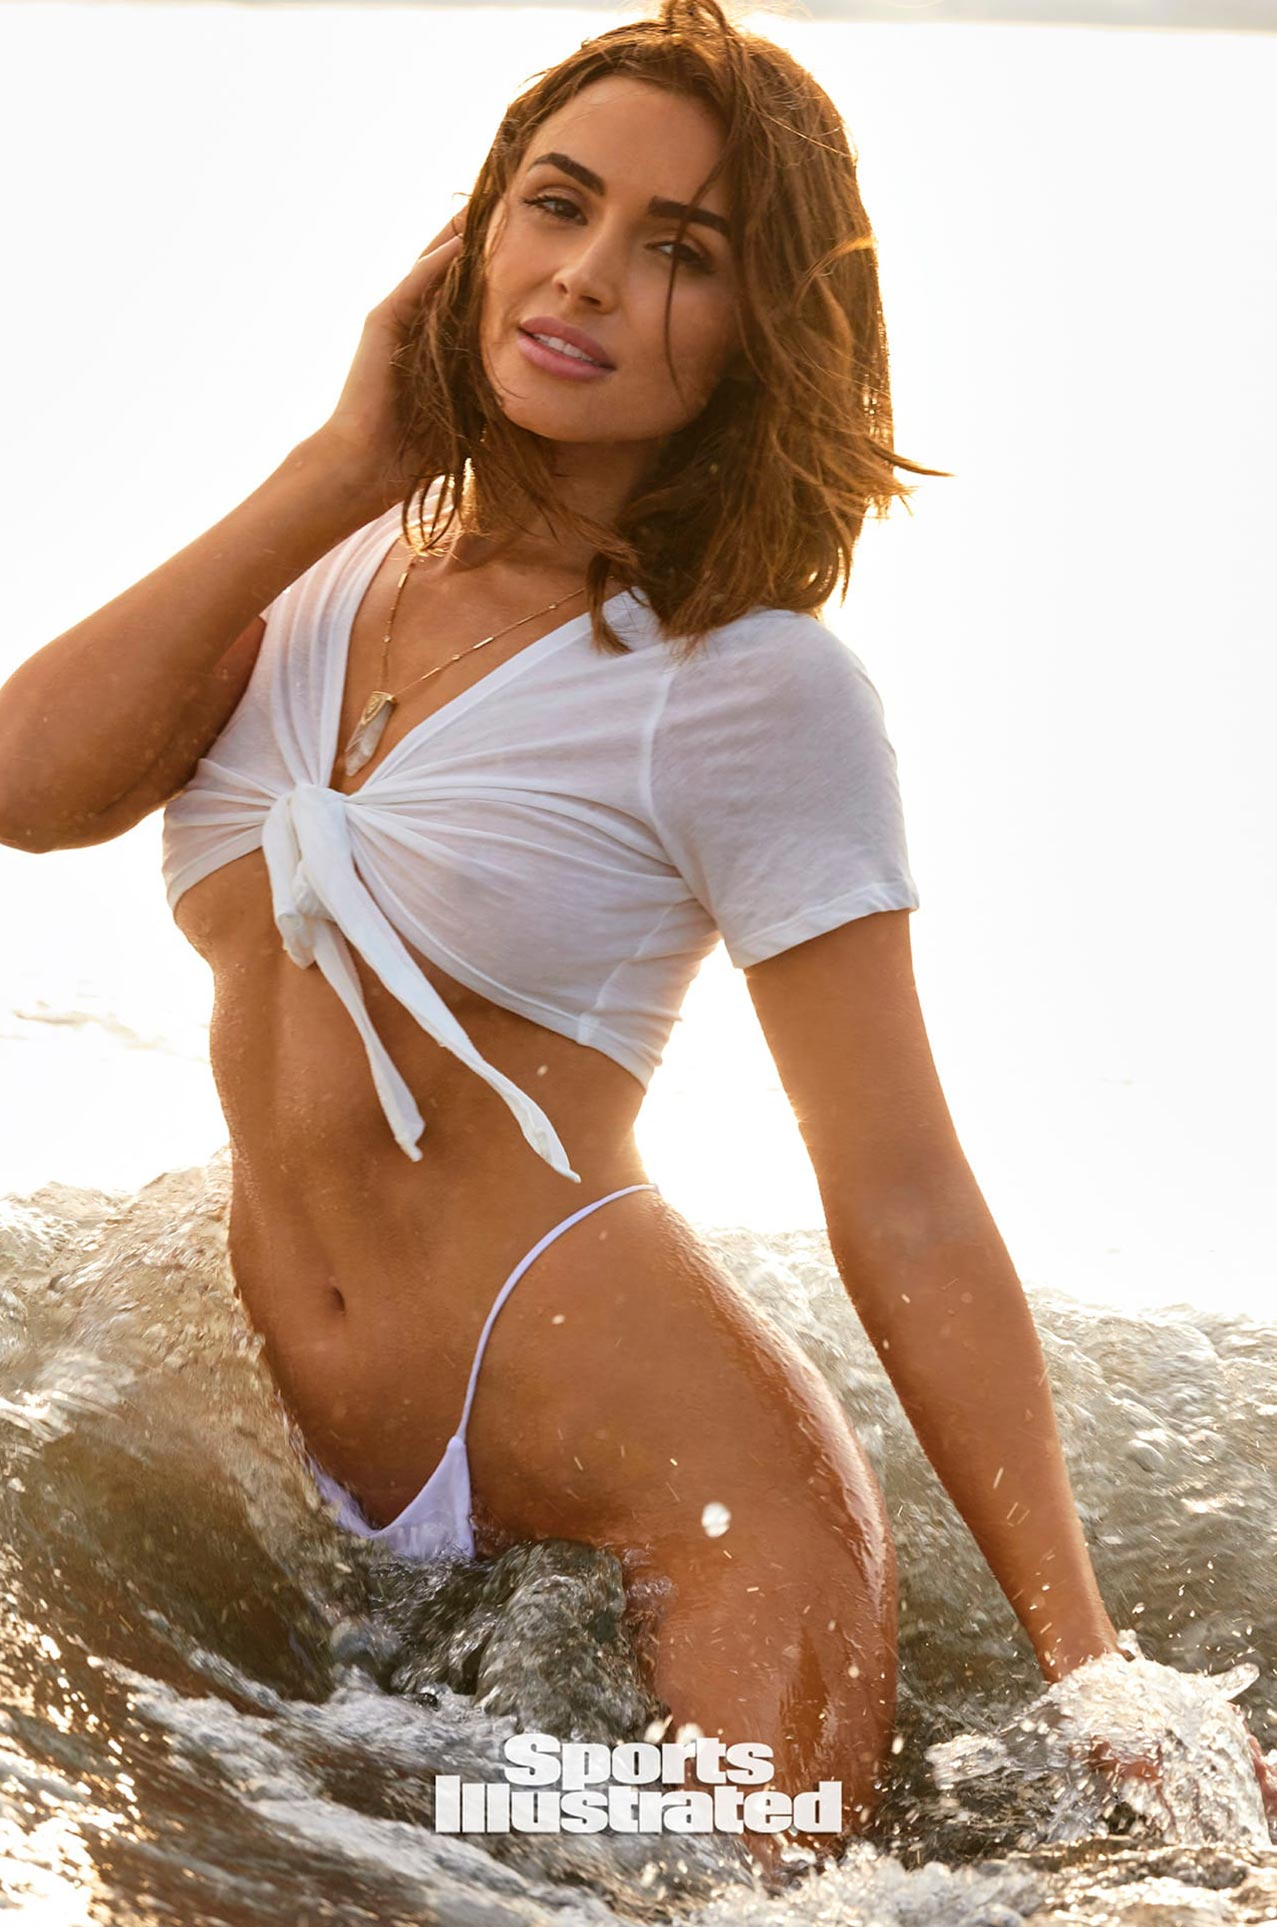 Оливия Калпо в каталоге купальников Sports Illustrated Swimsuit 2020 / фото 07